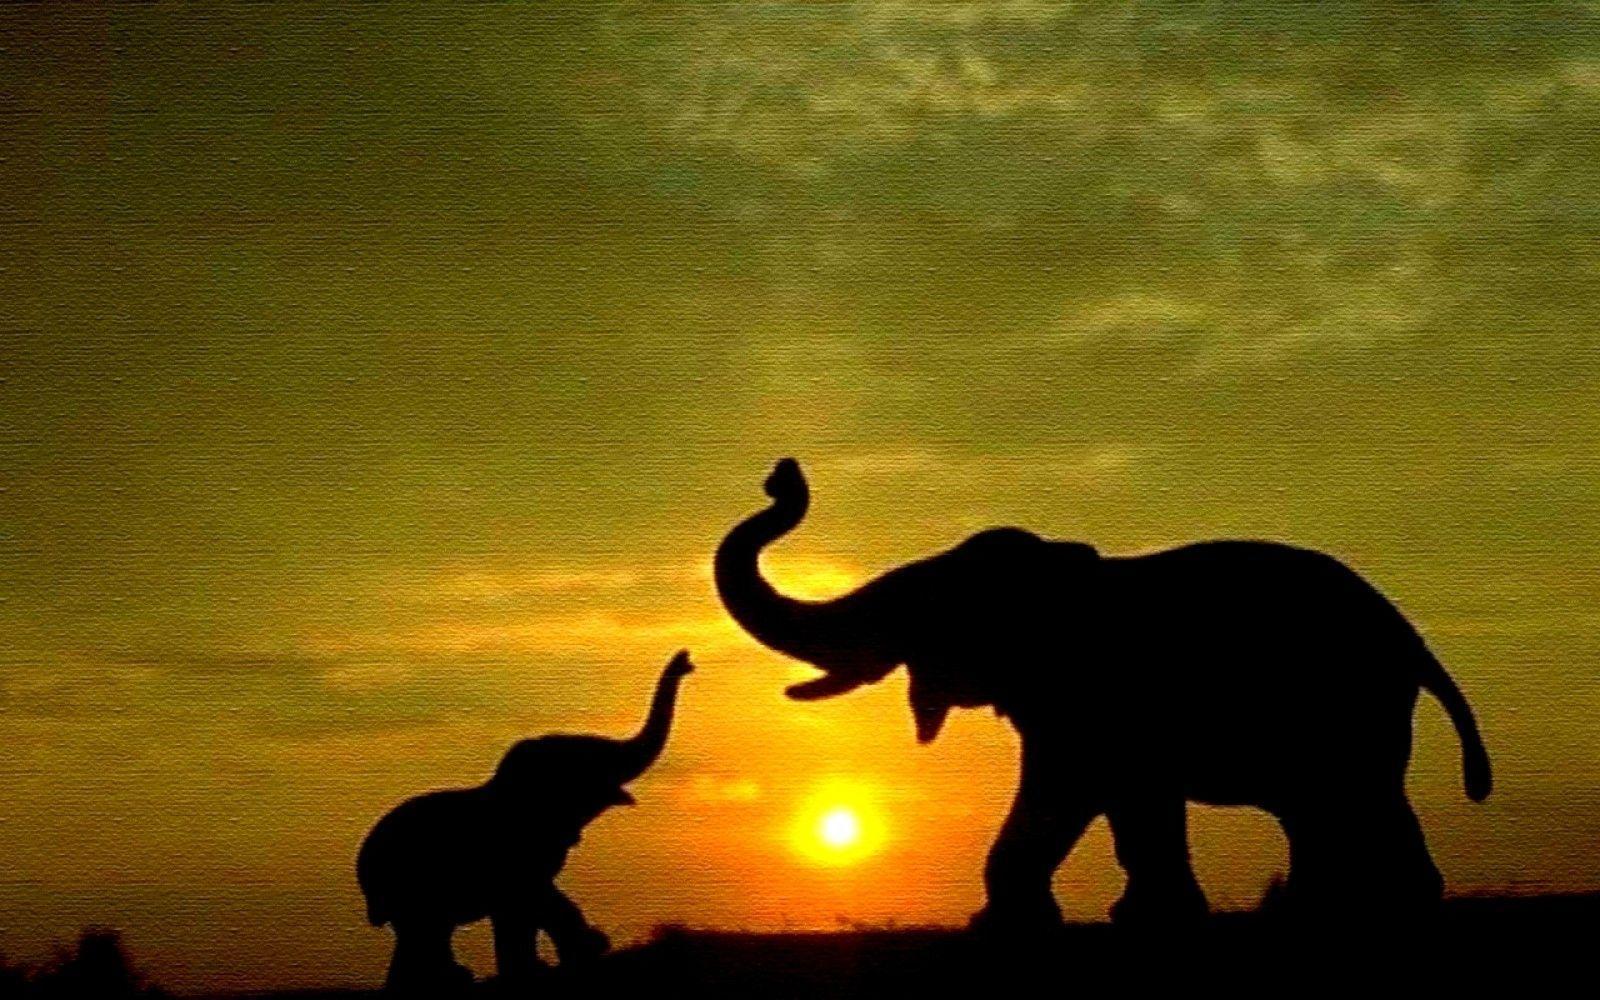 1080p Images: Decorated Kerala Elephant Wallpaper Hd 1080p